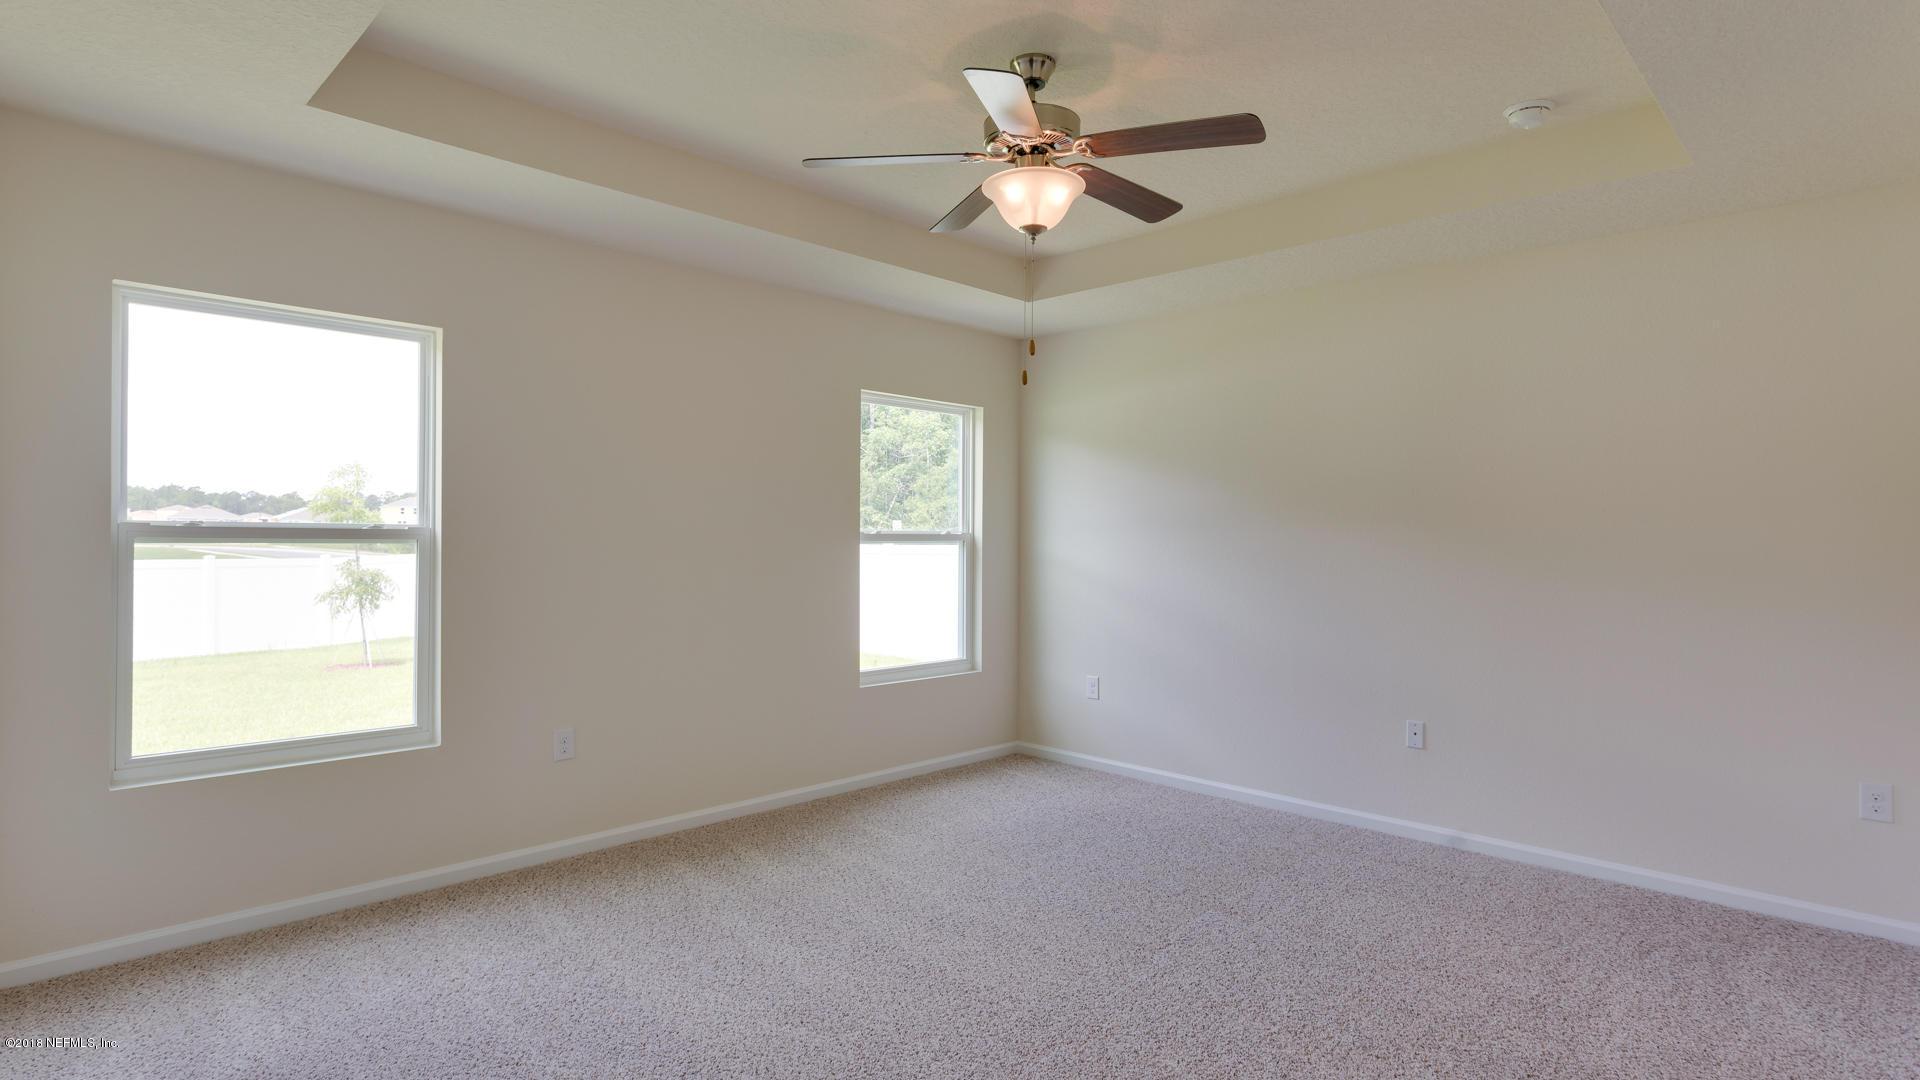 4139 SPRING CREEK, MIDDLEBURG, FLORIDA 32068, 3 Bedrooms Bedrooms, ,2 BathroomsBathrooms,Residential - single family,For sale,SPRING CREEK,911853